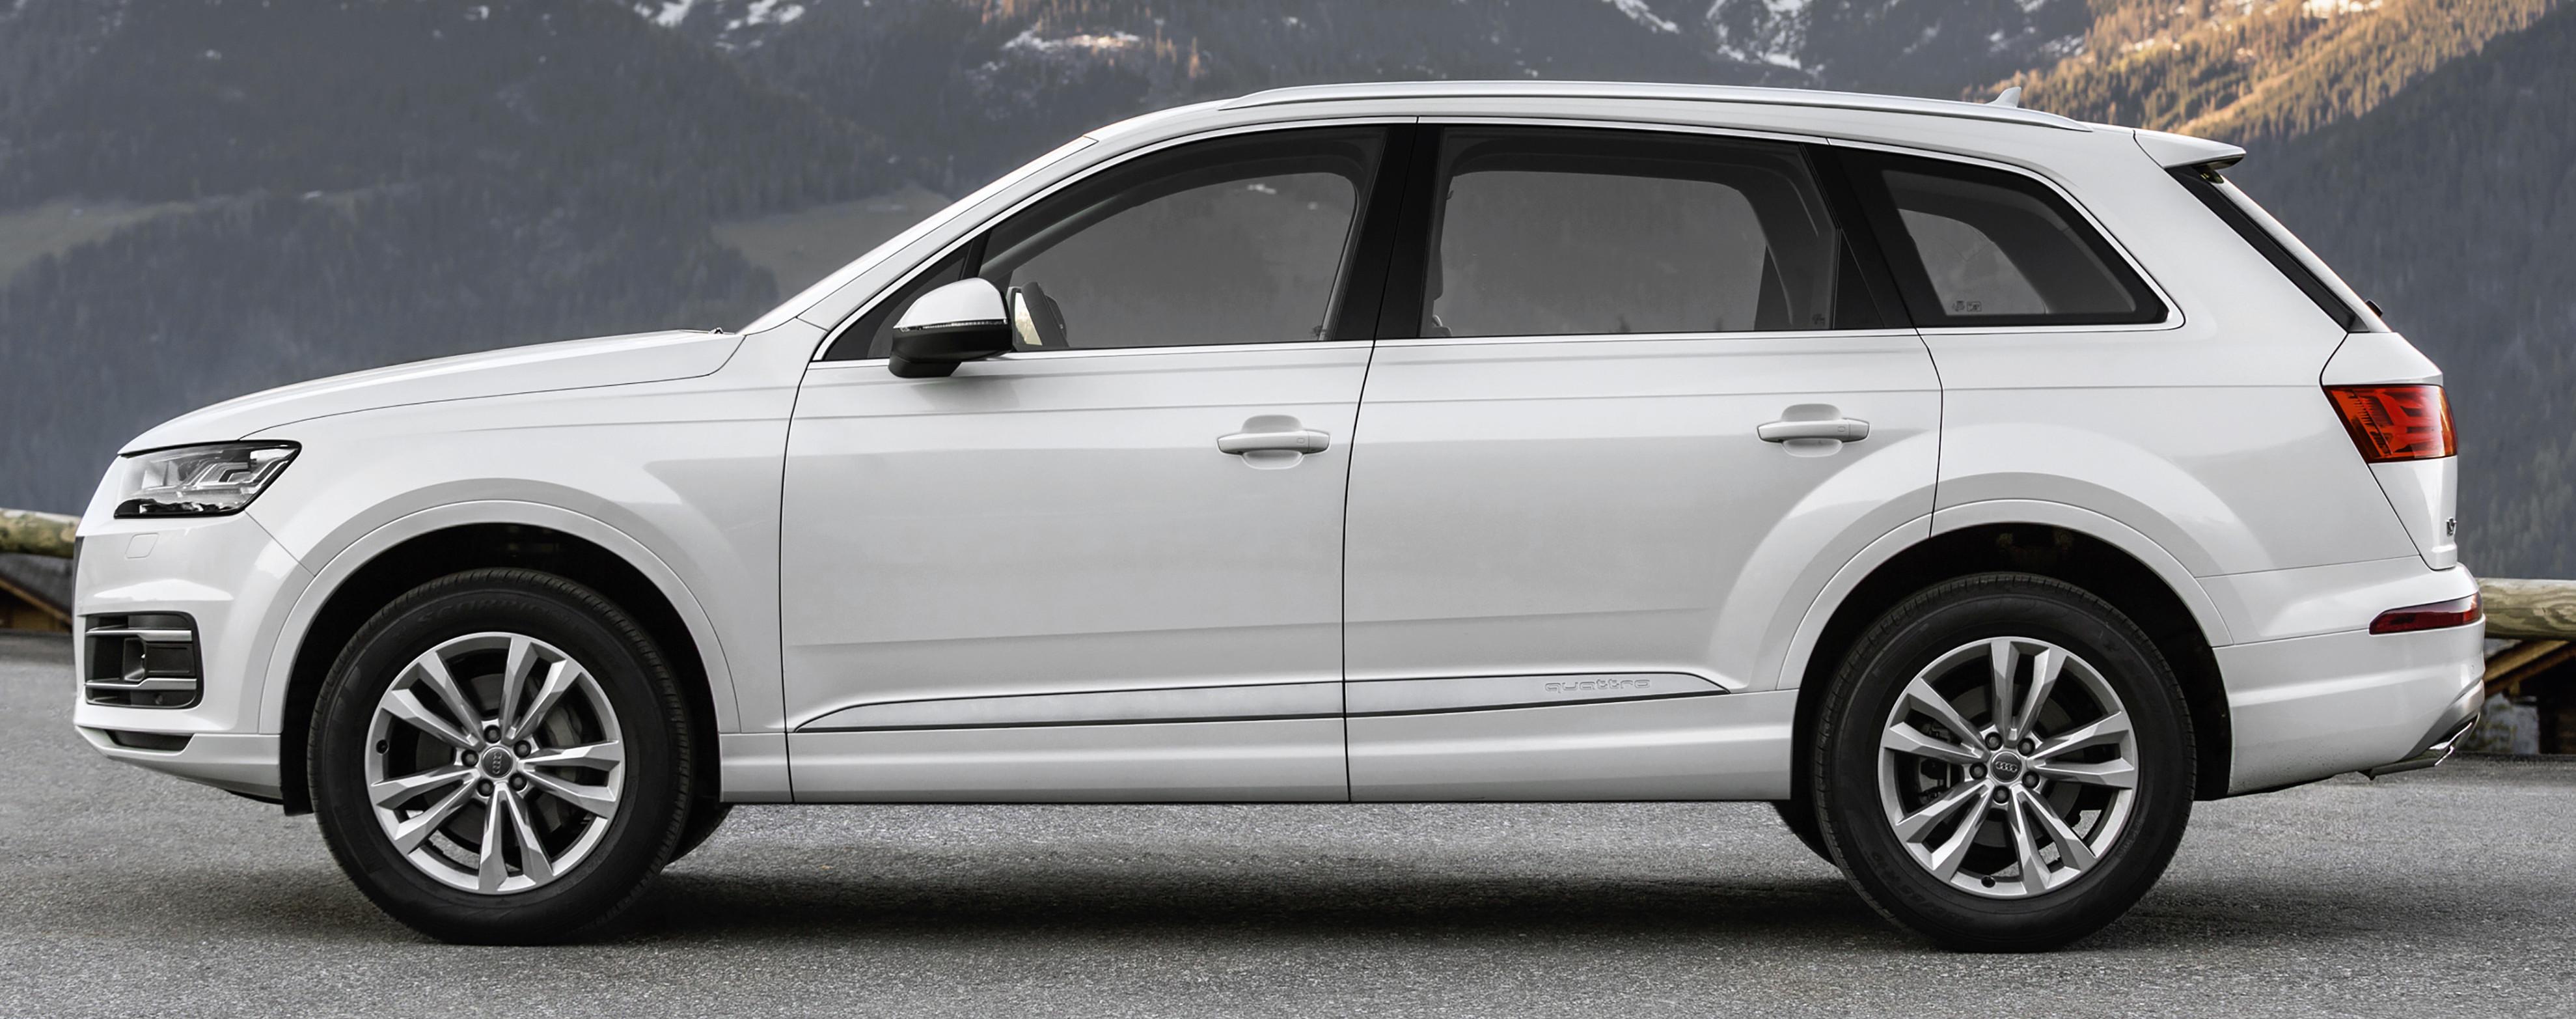 Audi Q7 2 0 Tfsi Quattro Debuts In Malaysia Rm525k Image